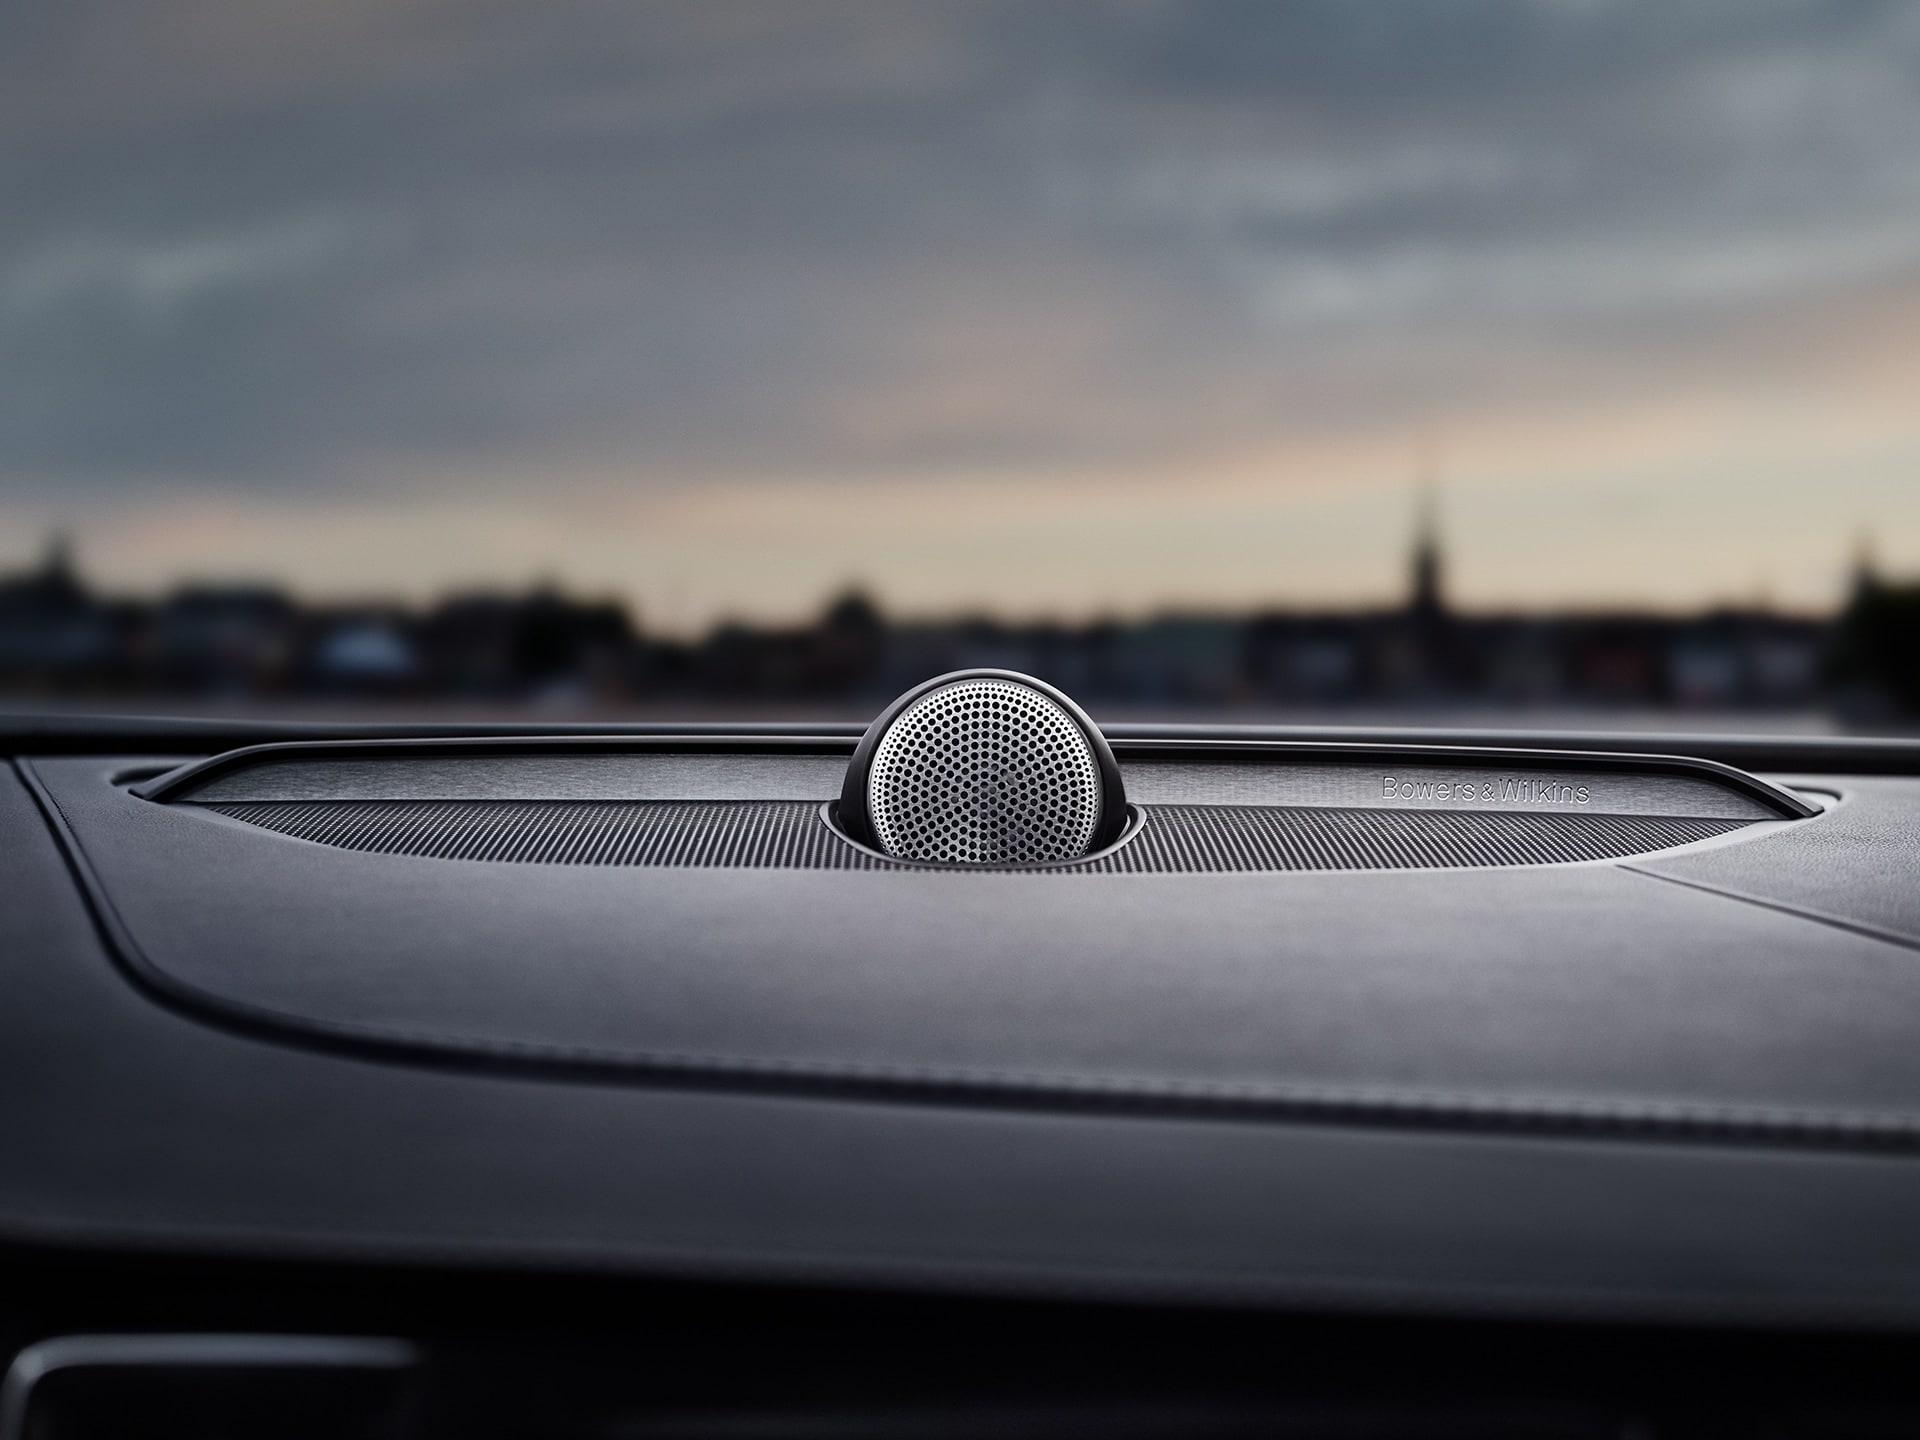 Bowers & Wilkins speakers inside a Volvo XC90